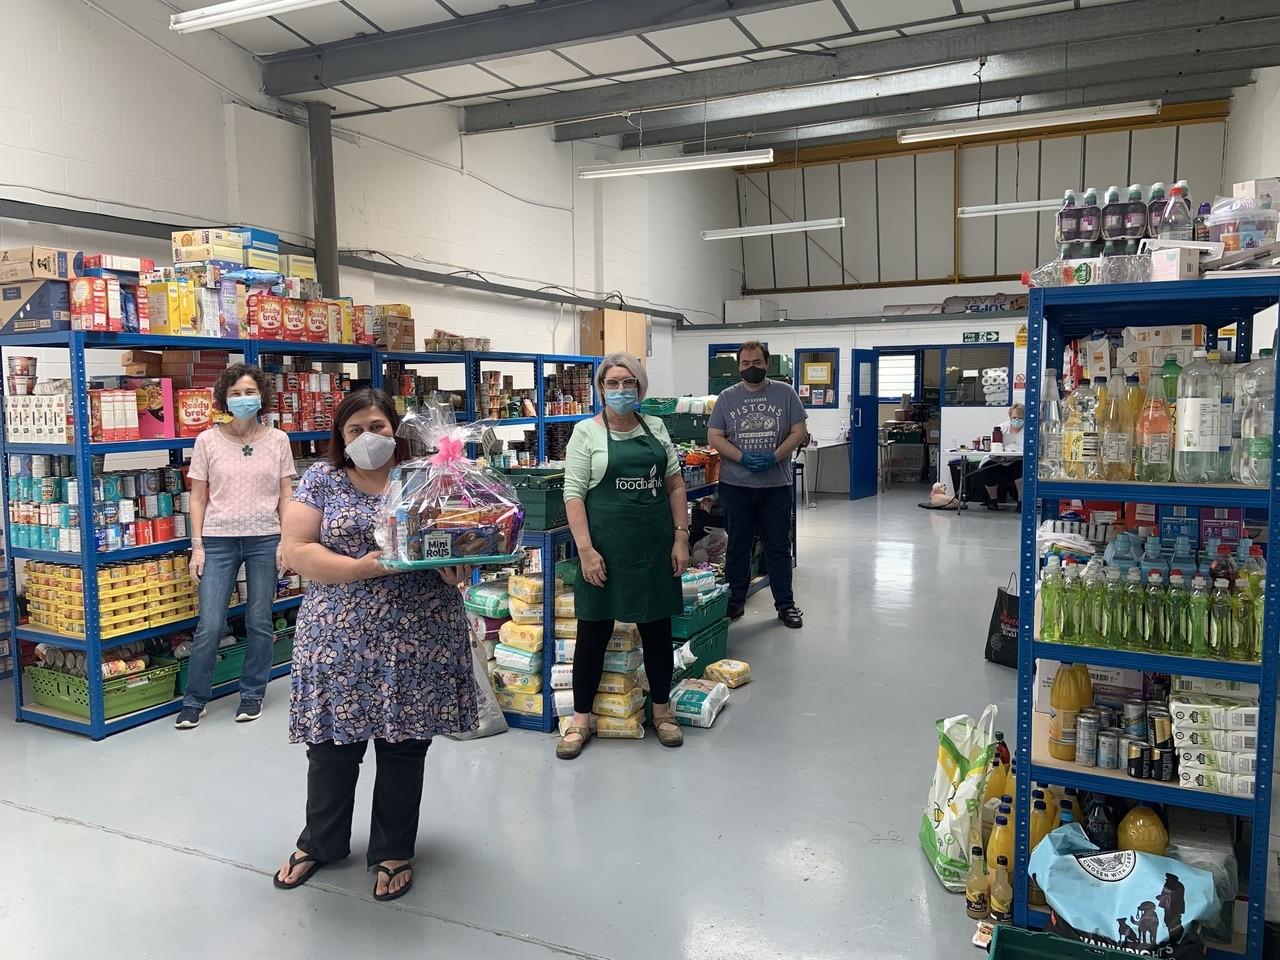 Swale Foodbank receive a big thank you | Asda Sittingbourne